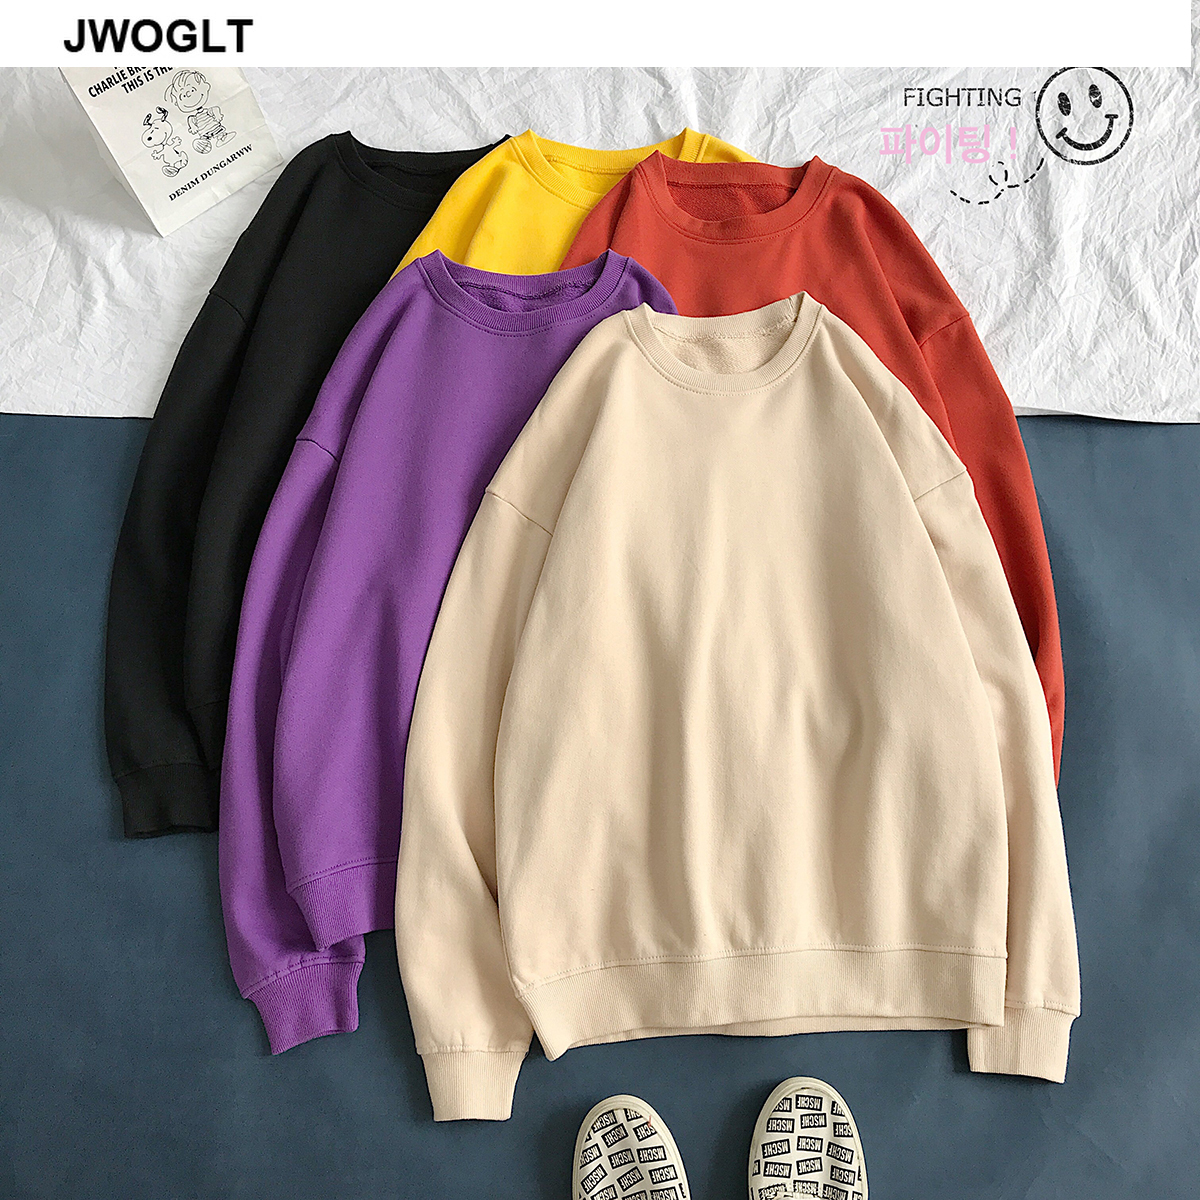 Big SaleⁿMen's Hoodies Sweatshirts Wear Long-Sleeve 12-Colors Casual Fashion Cotton O-Neck Solid